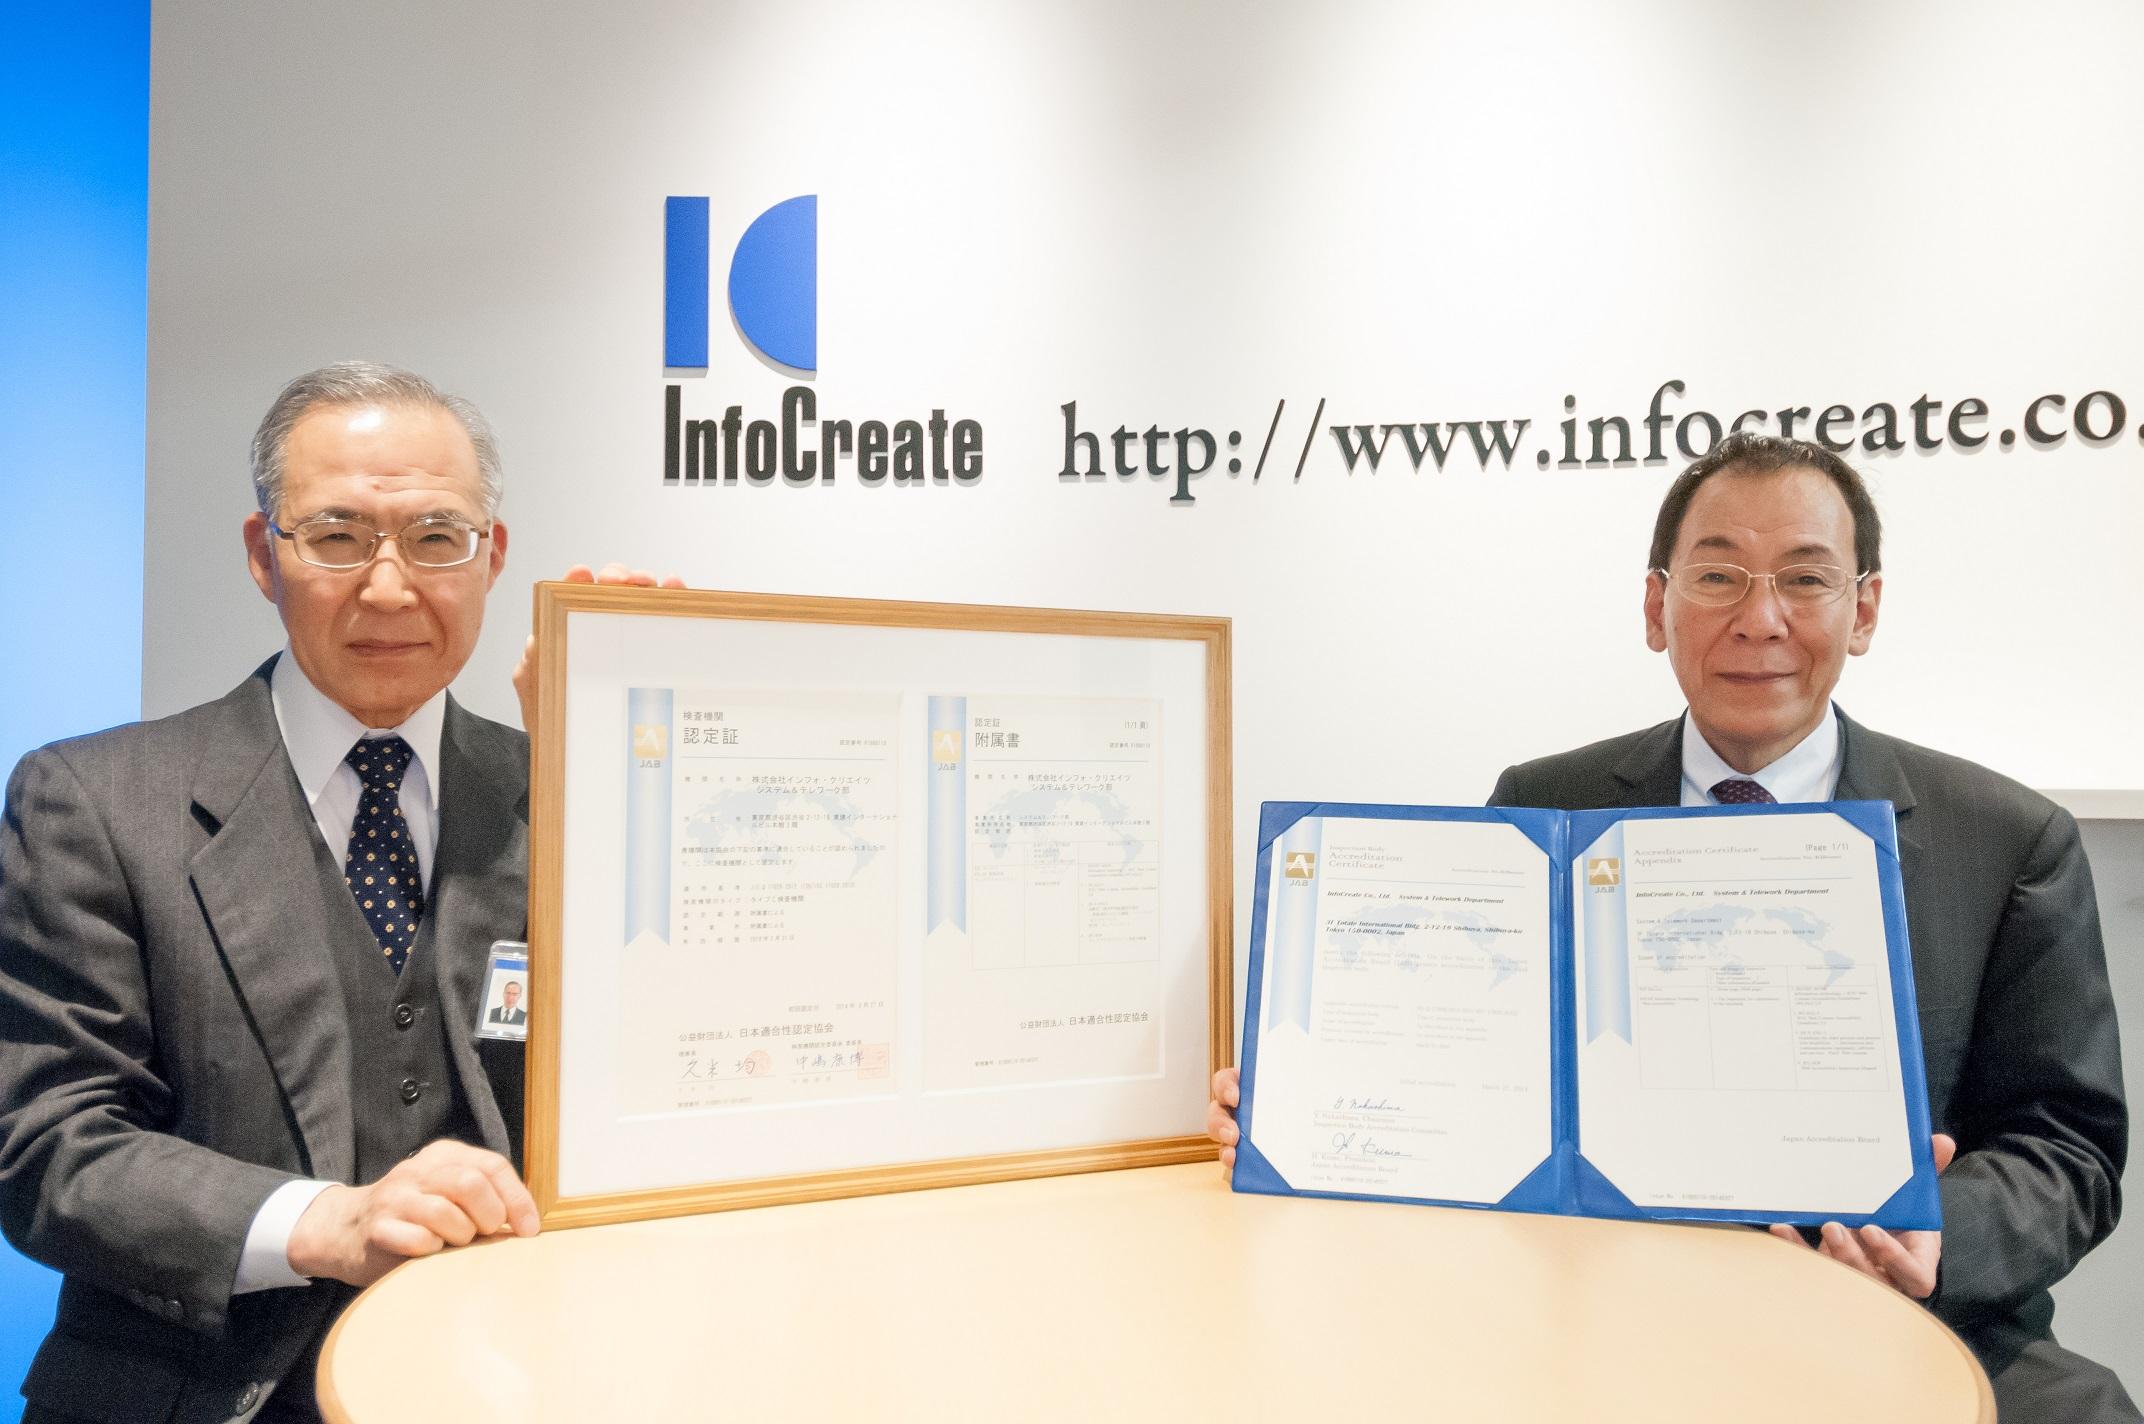 認定受理の報告、品川取締役と加藤社長